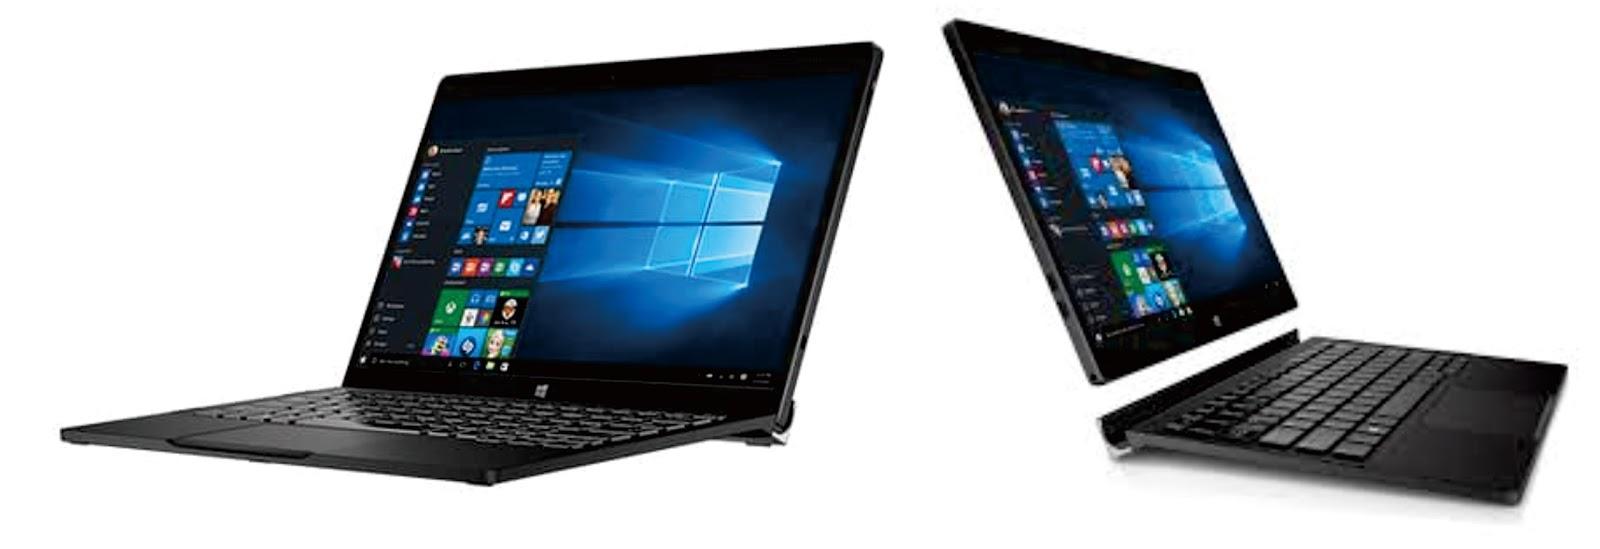 Dell Drivers Download Windows 10 64 Bit